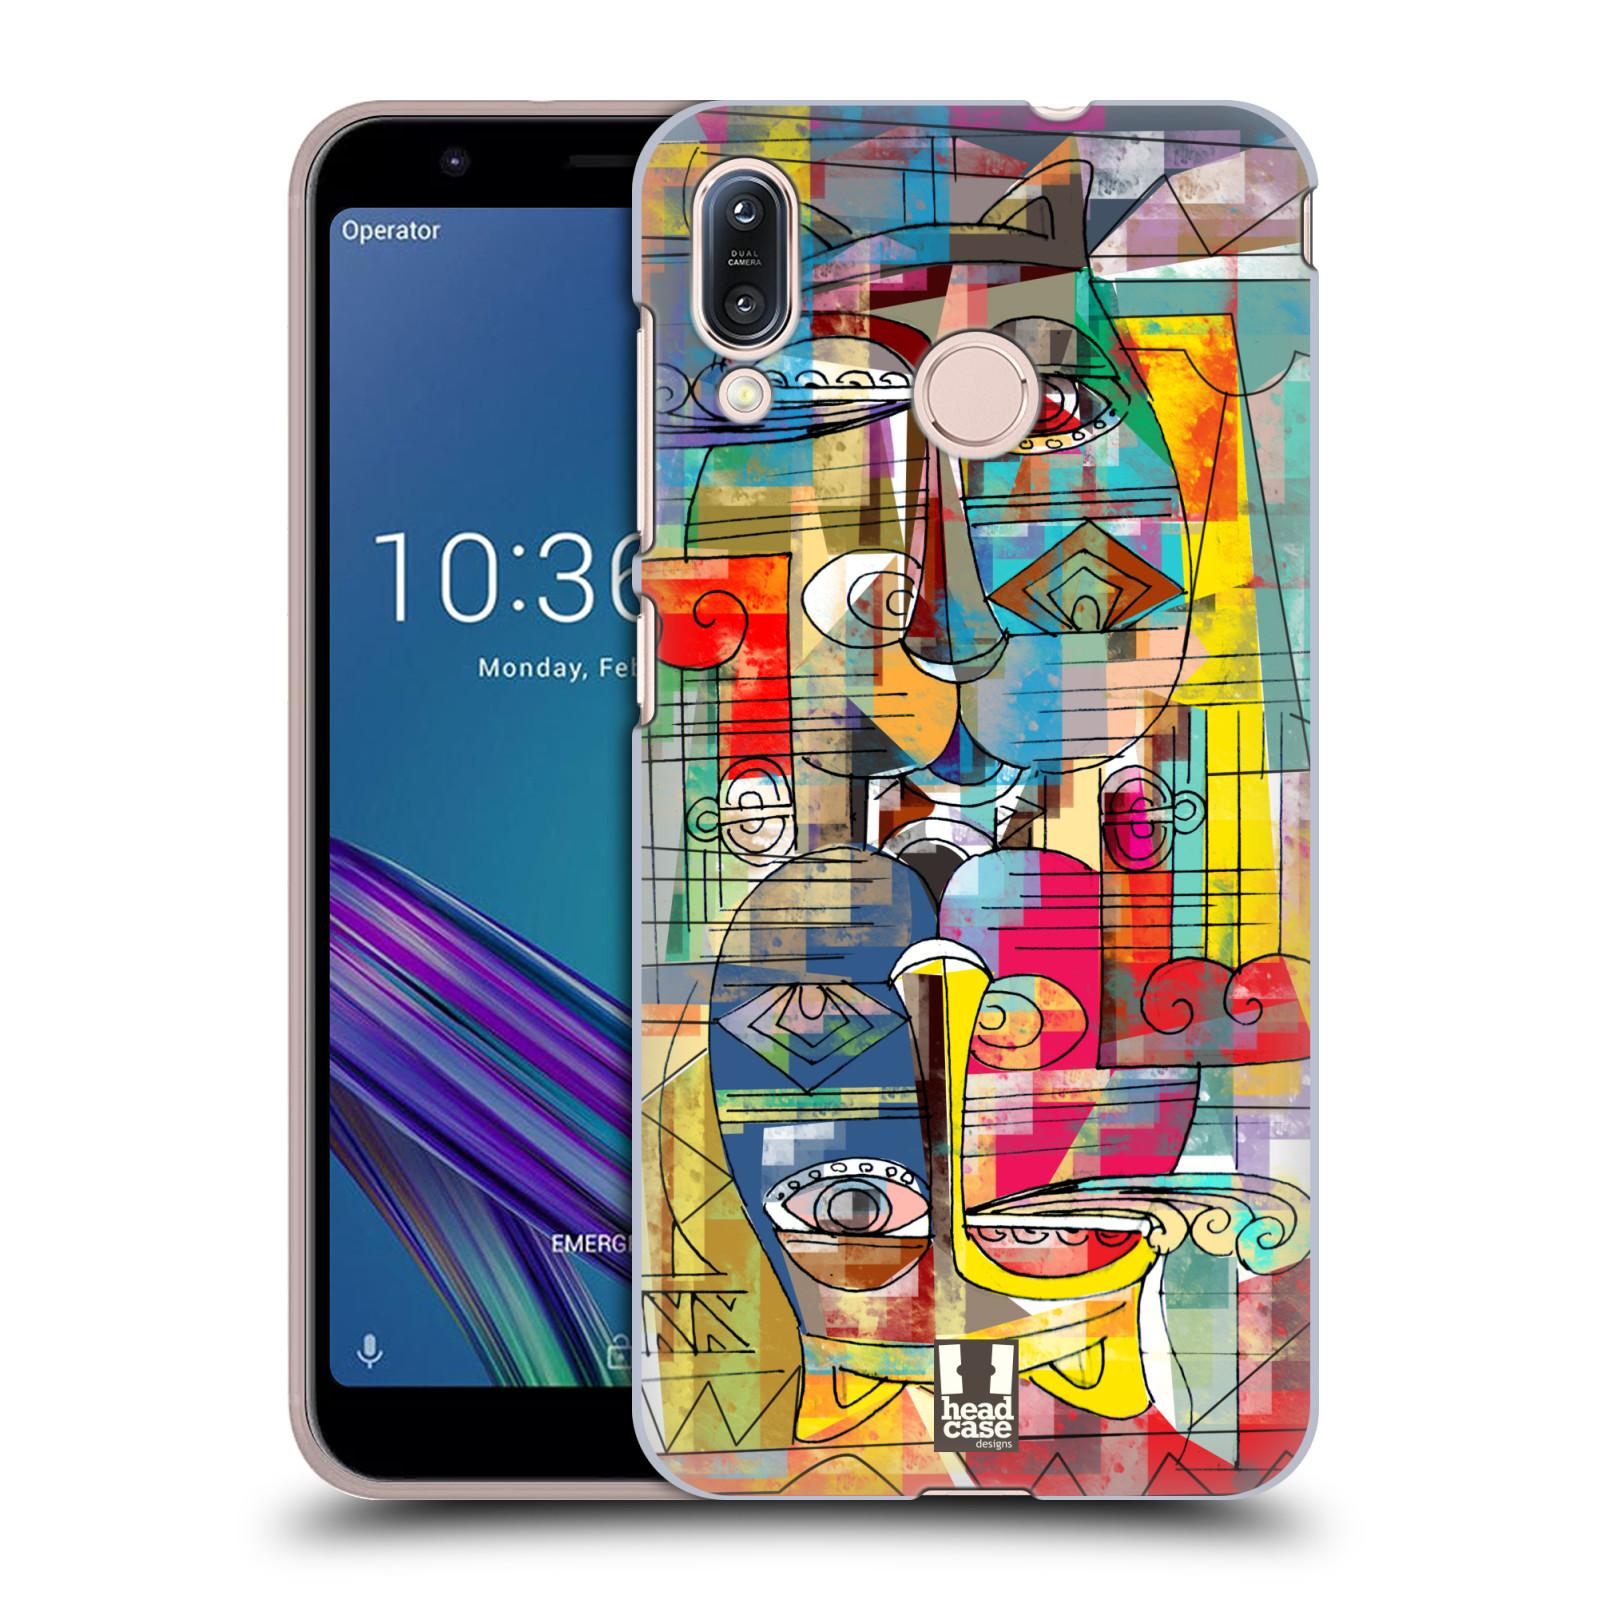 Plastové pouzdro na mobil Asus Zenfone Max M1 ZB555KL - Head Case - AZTEC MANX